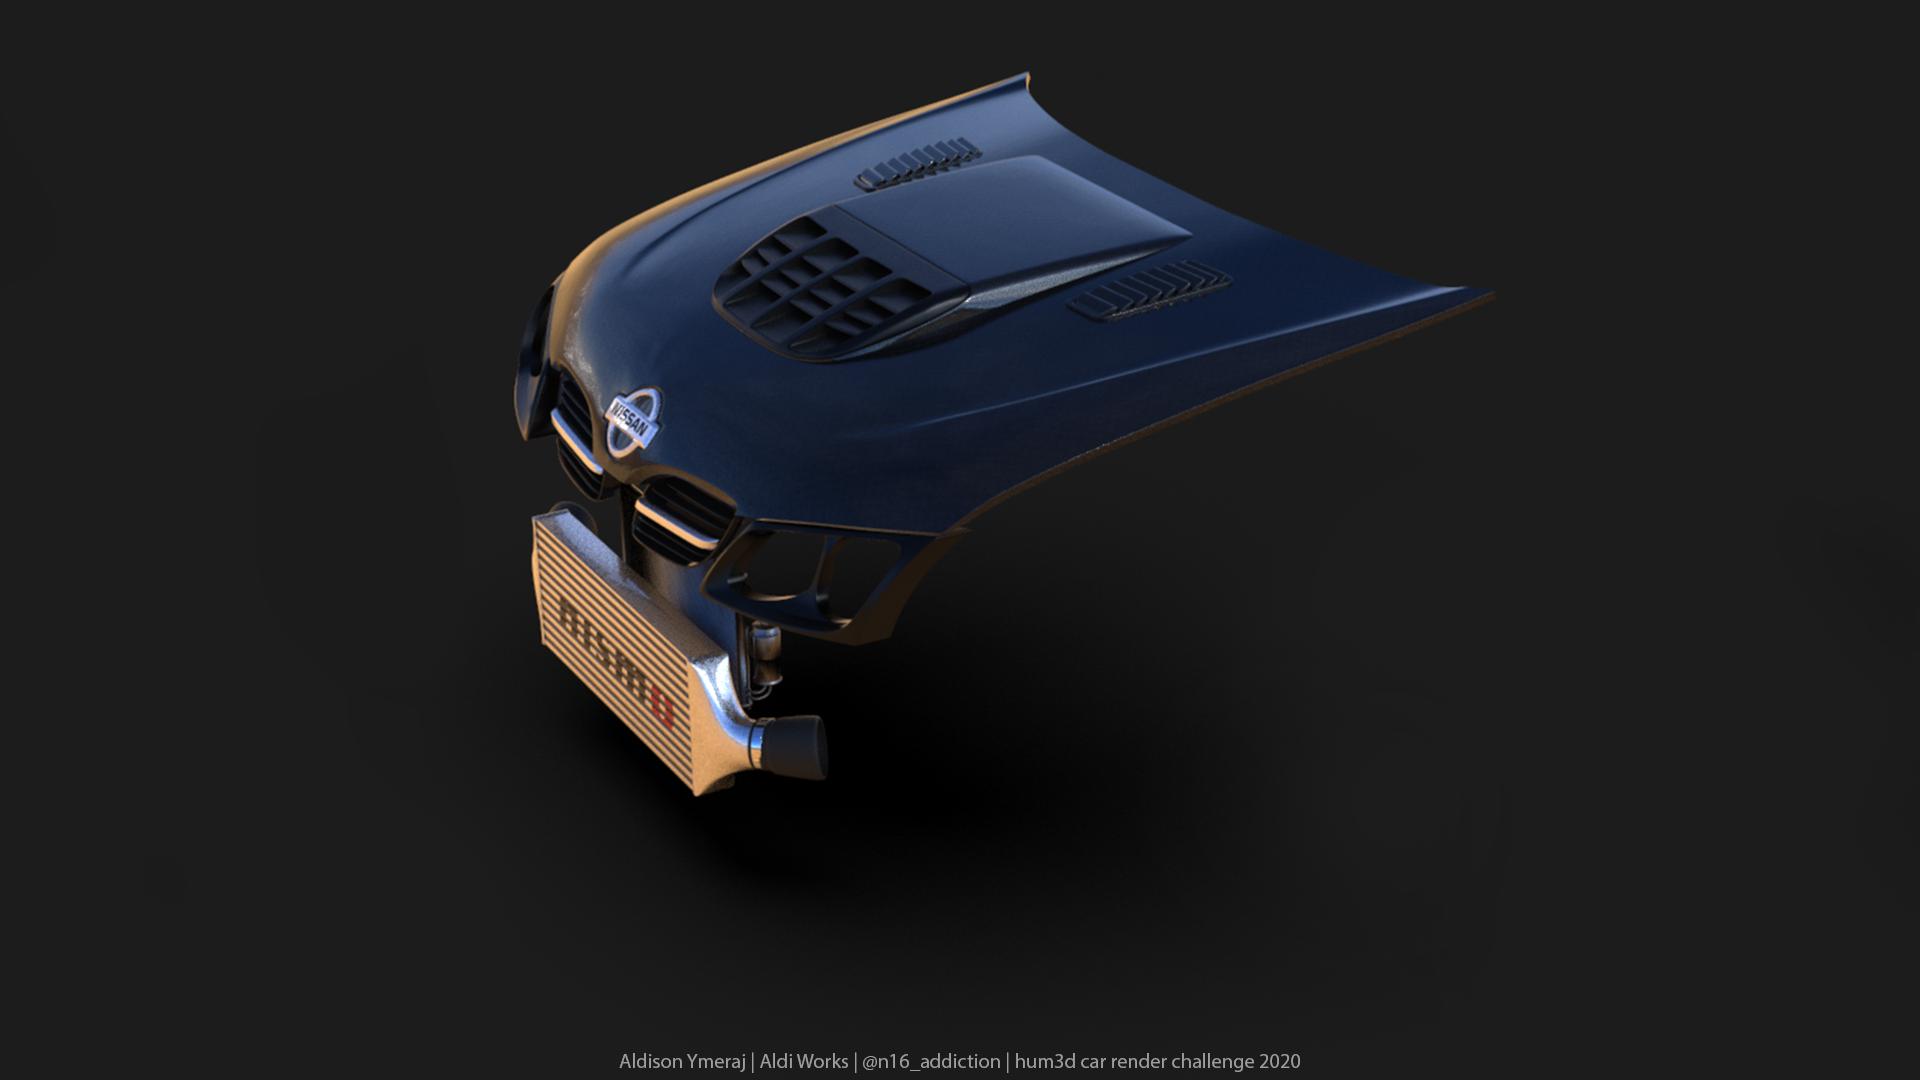 N16 Addiction - Car Render Challenge 2020